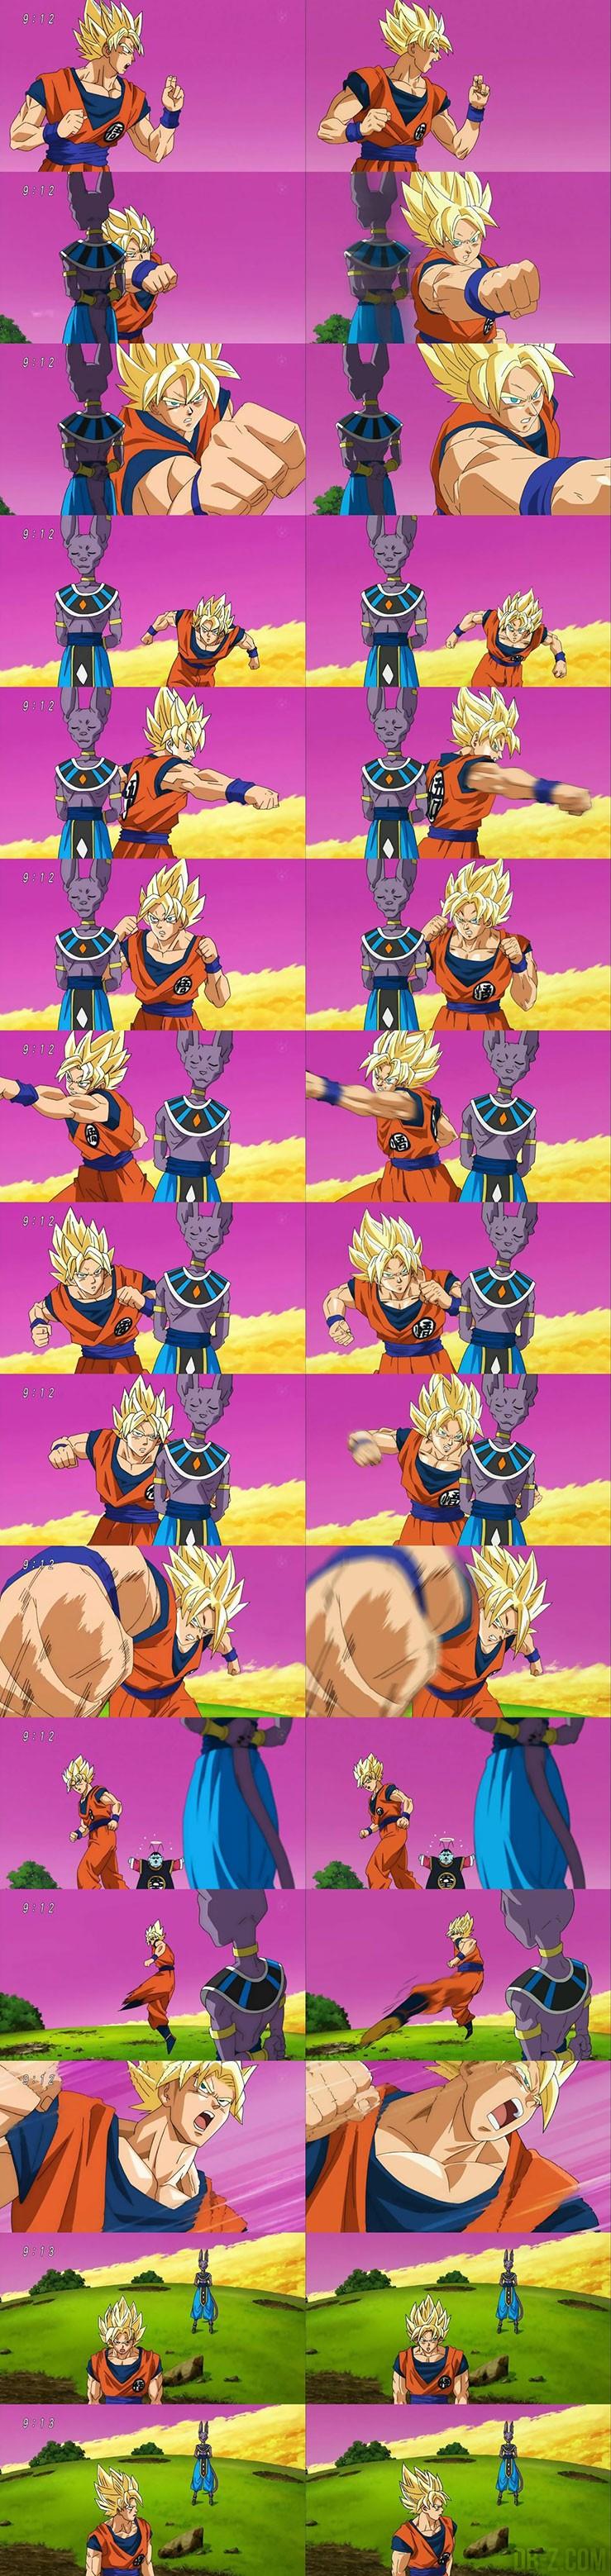 Dragon-Ball-Super-Episode-5-v2-a